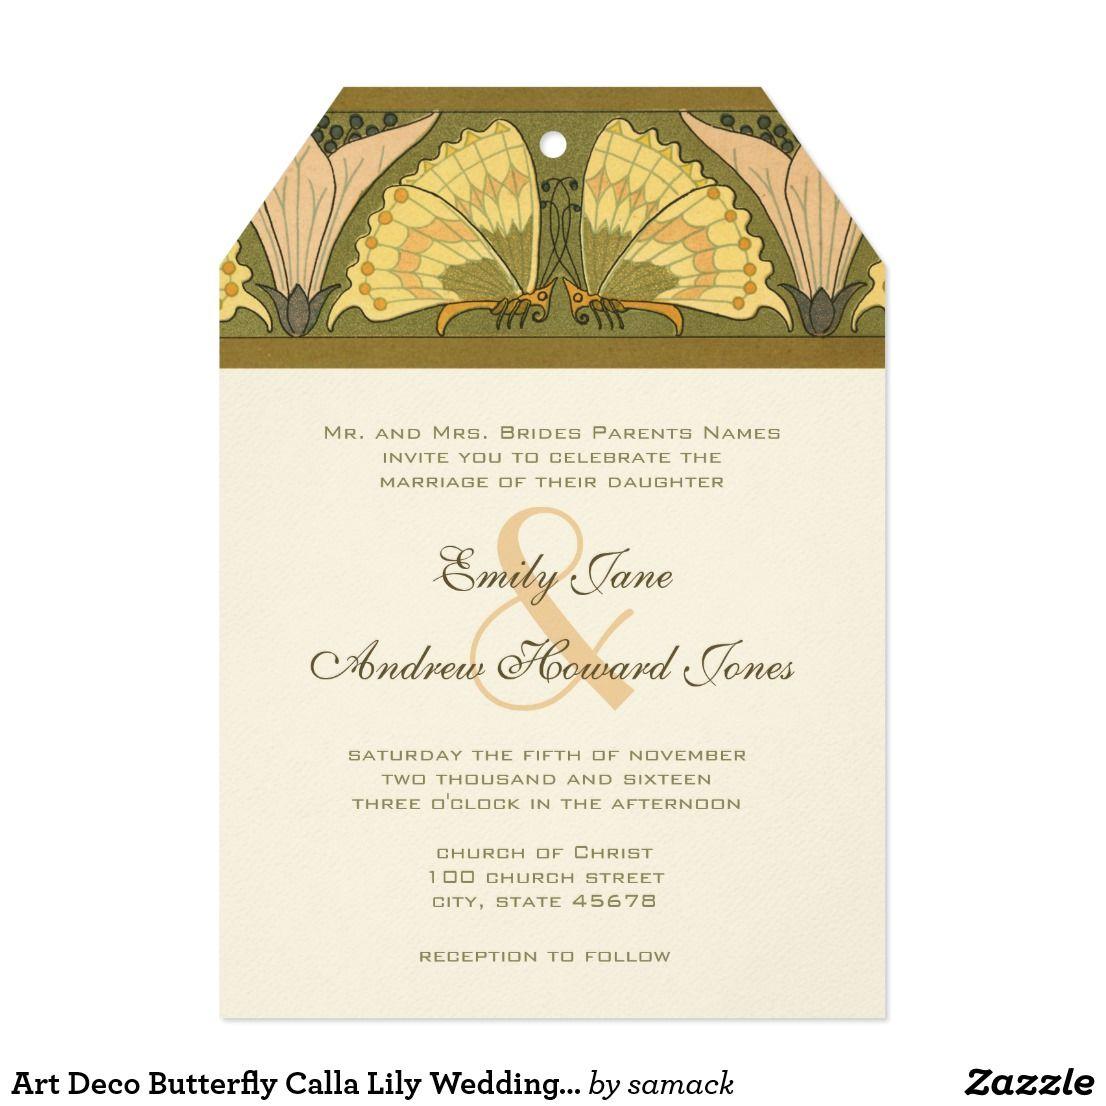 Art Deco Butterfly Calla Lily Wedding Invitation | Calla lilies and ...